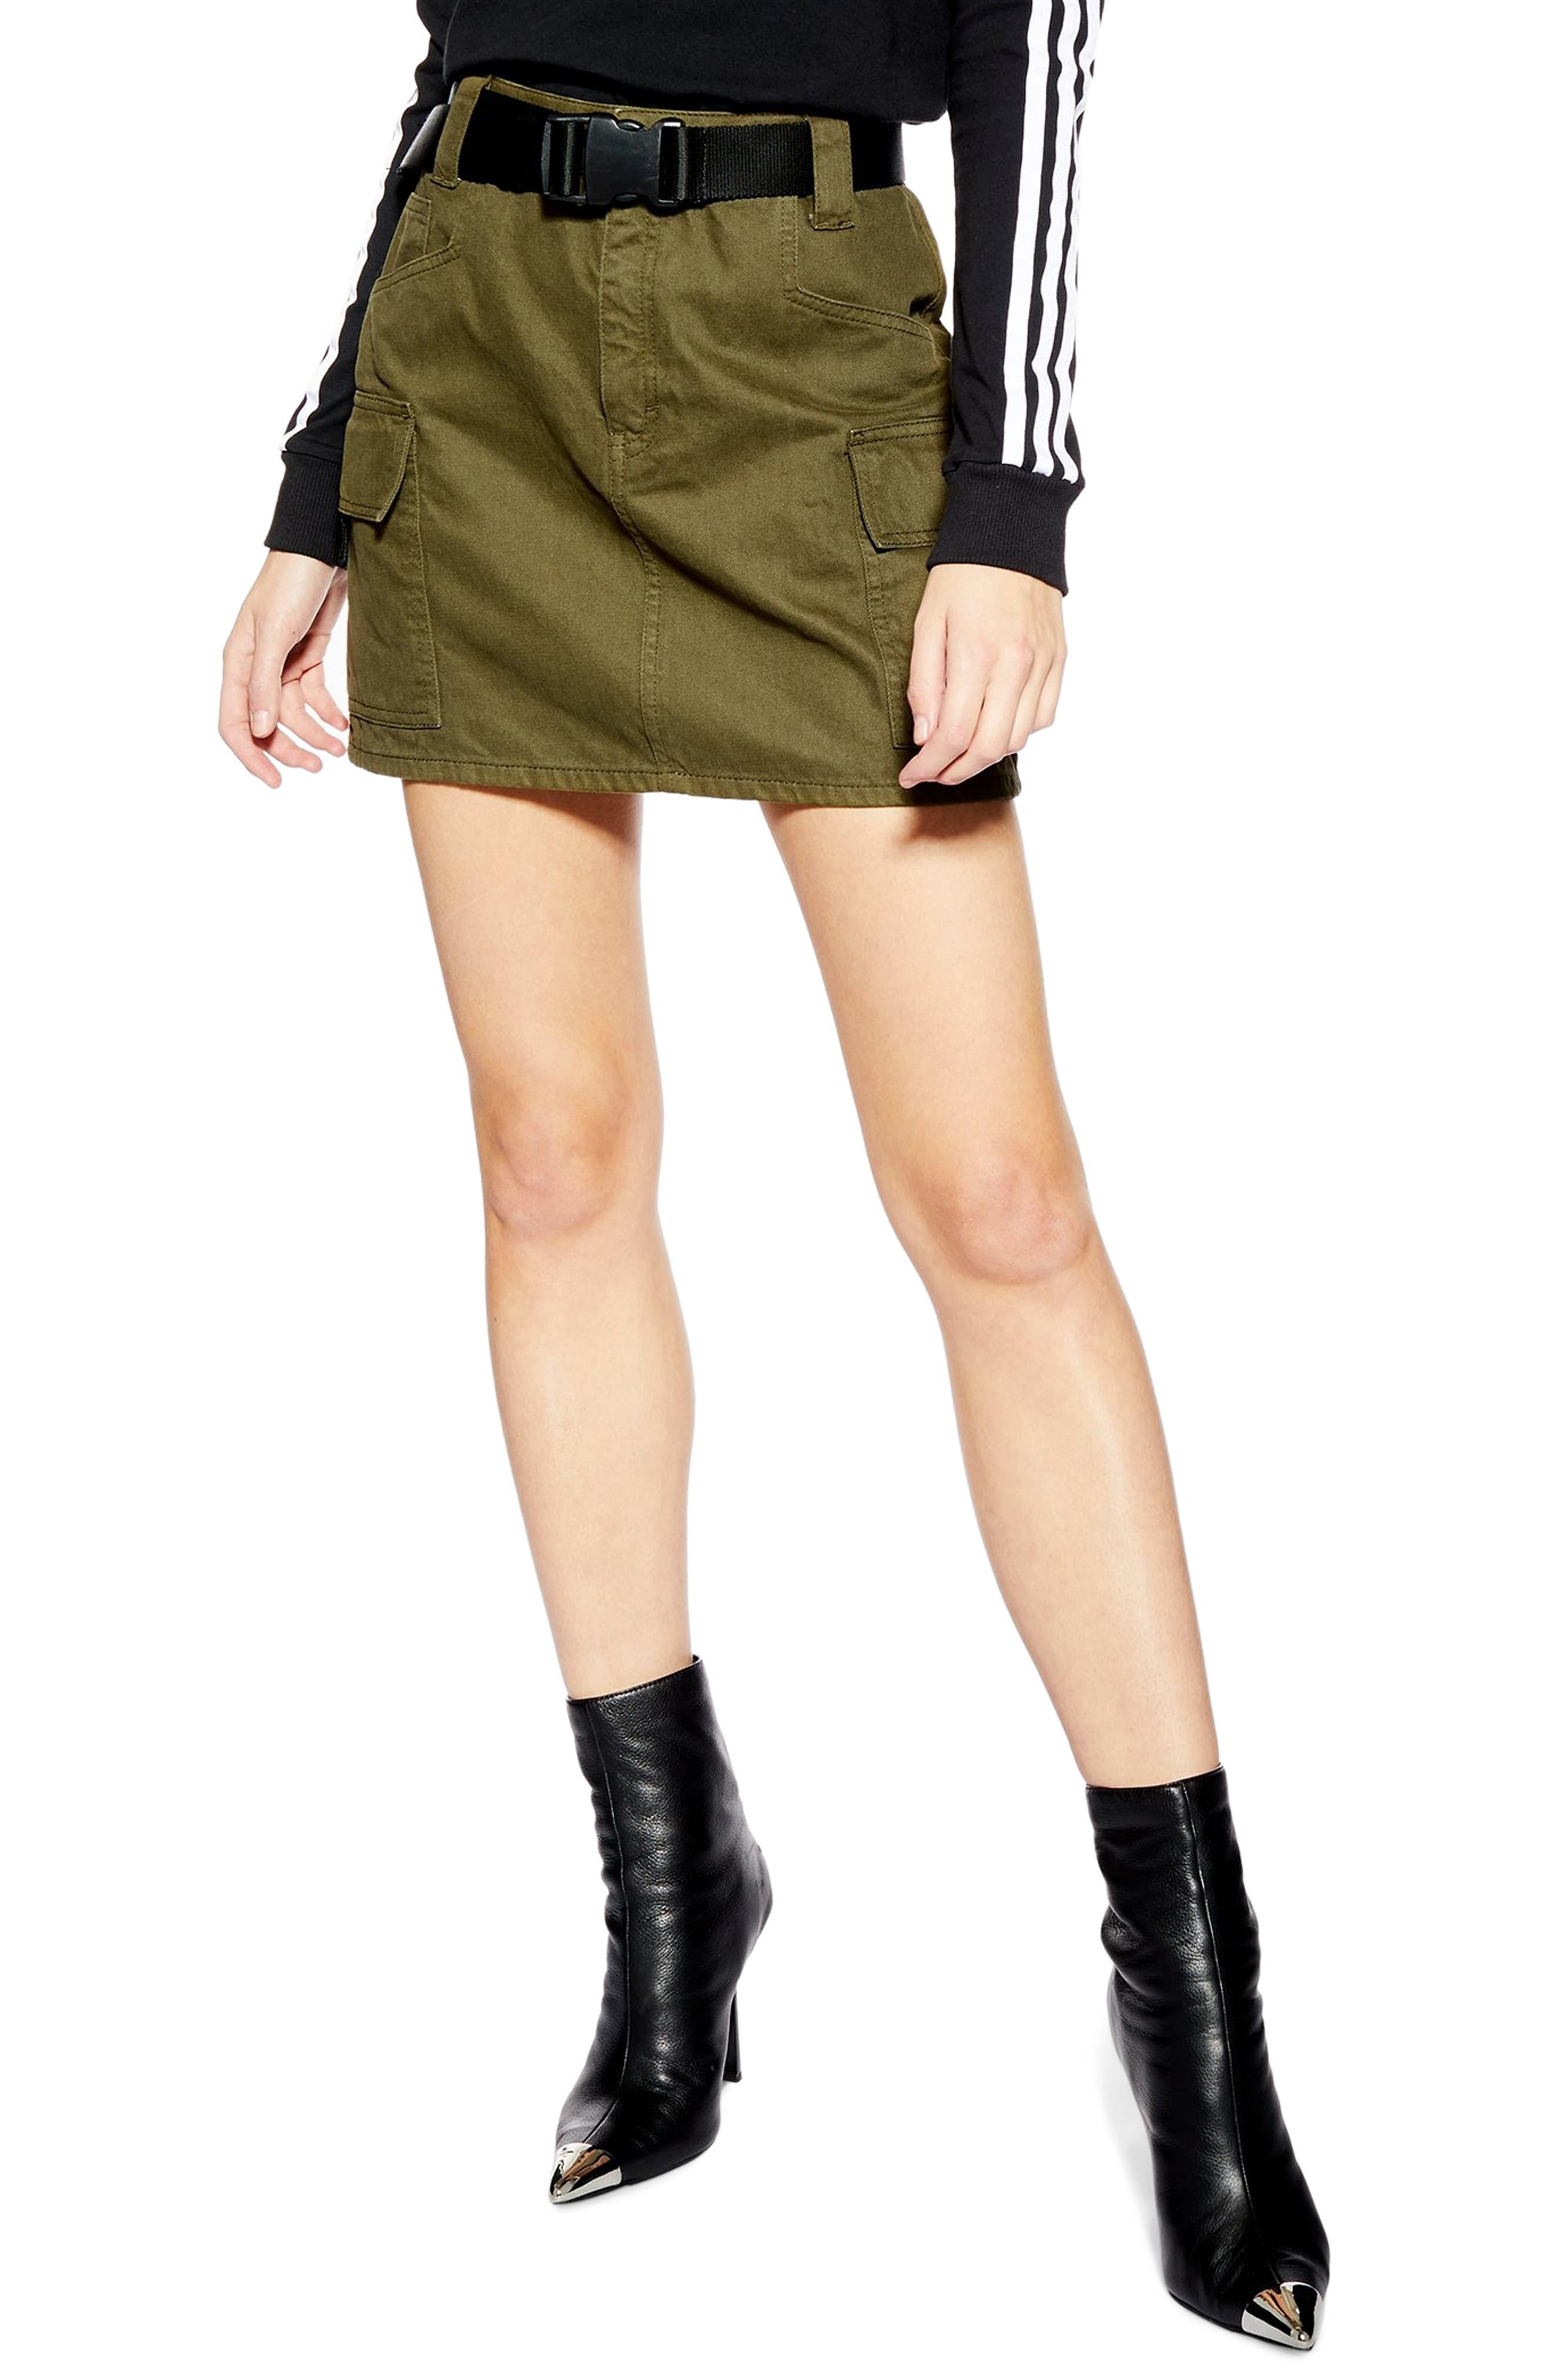 Topshop Utility Denim Miniskirt, US (fits like 14) - Green